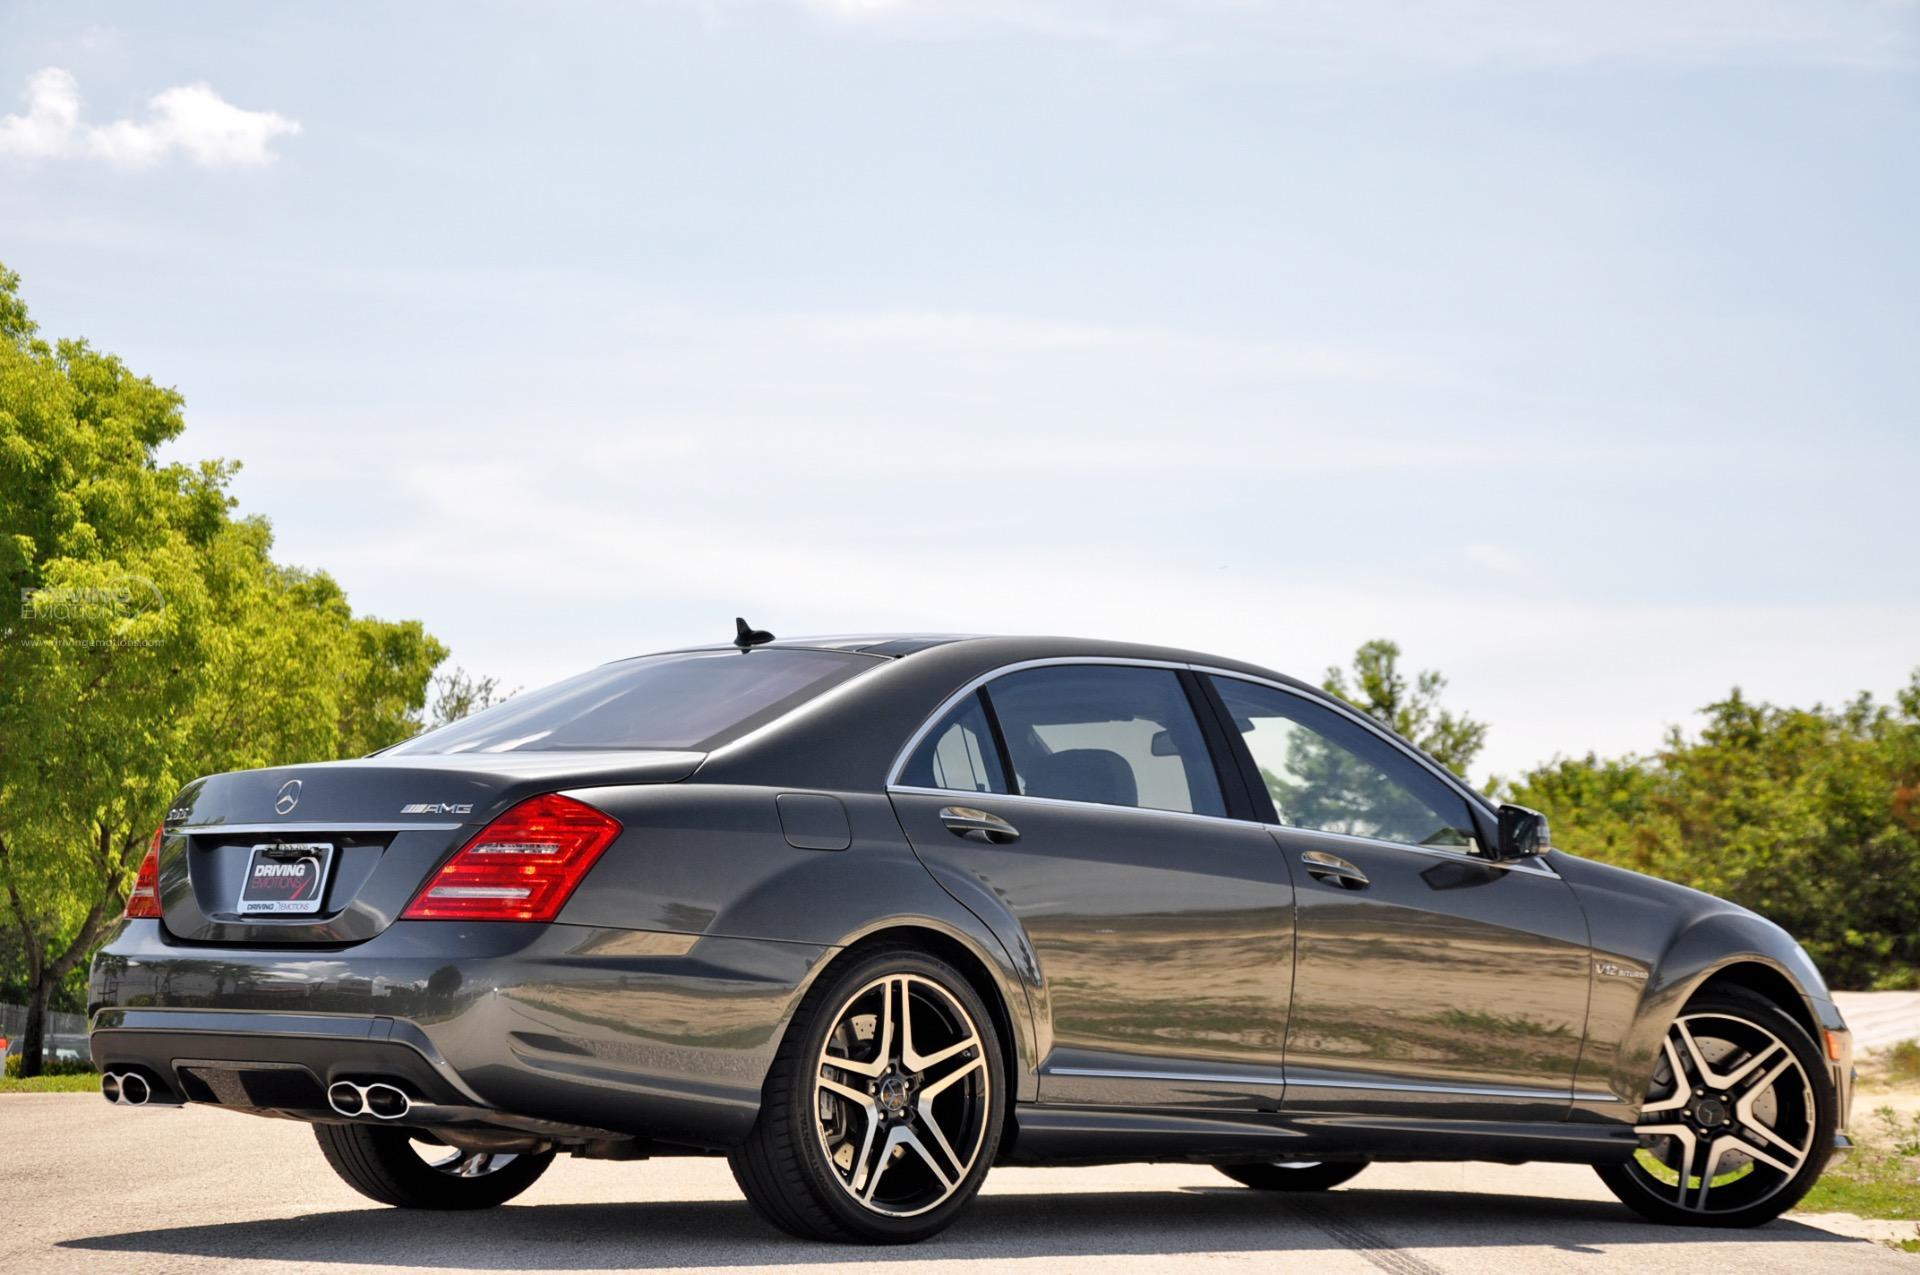 2012 mercedes benz s65 amg 65 amg v12 bi turbo stock for Mercedes benz amg s65